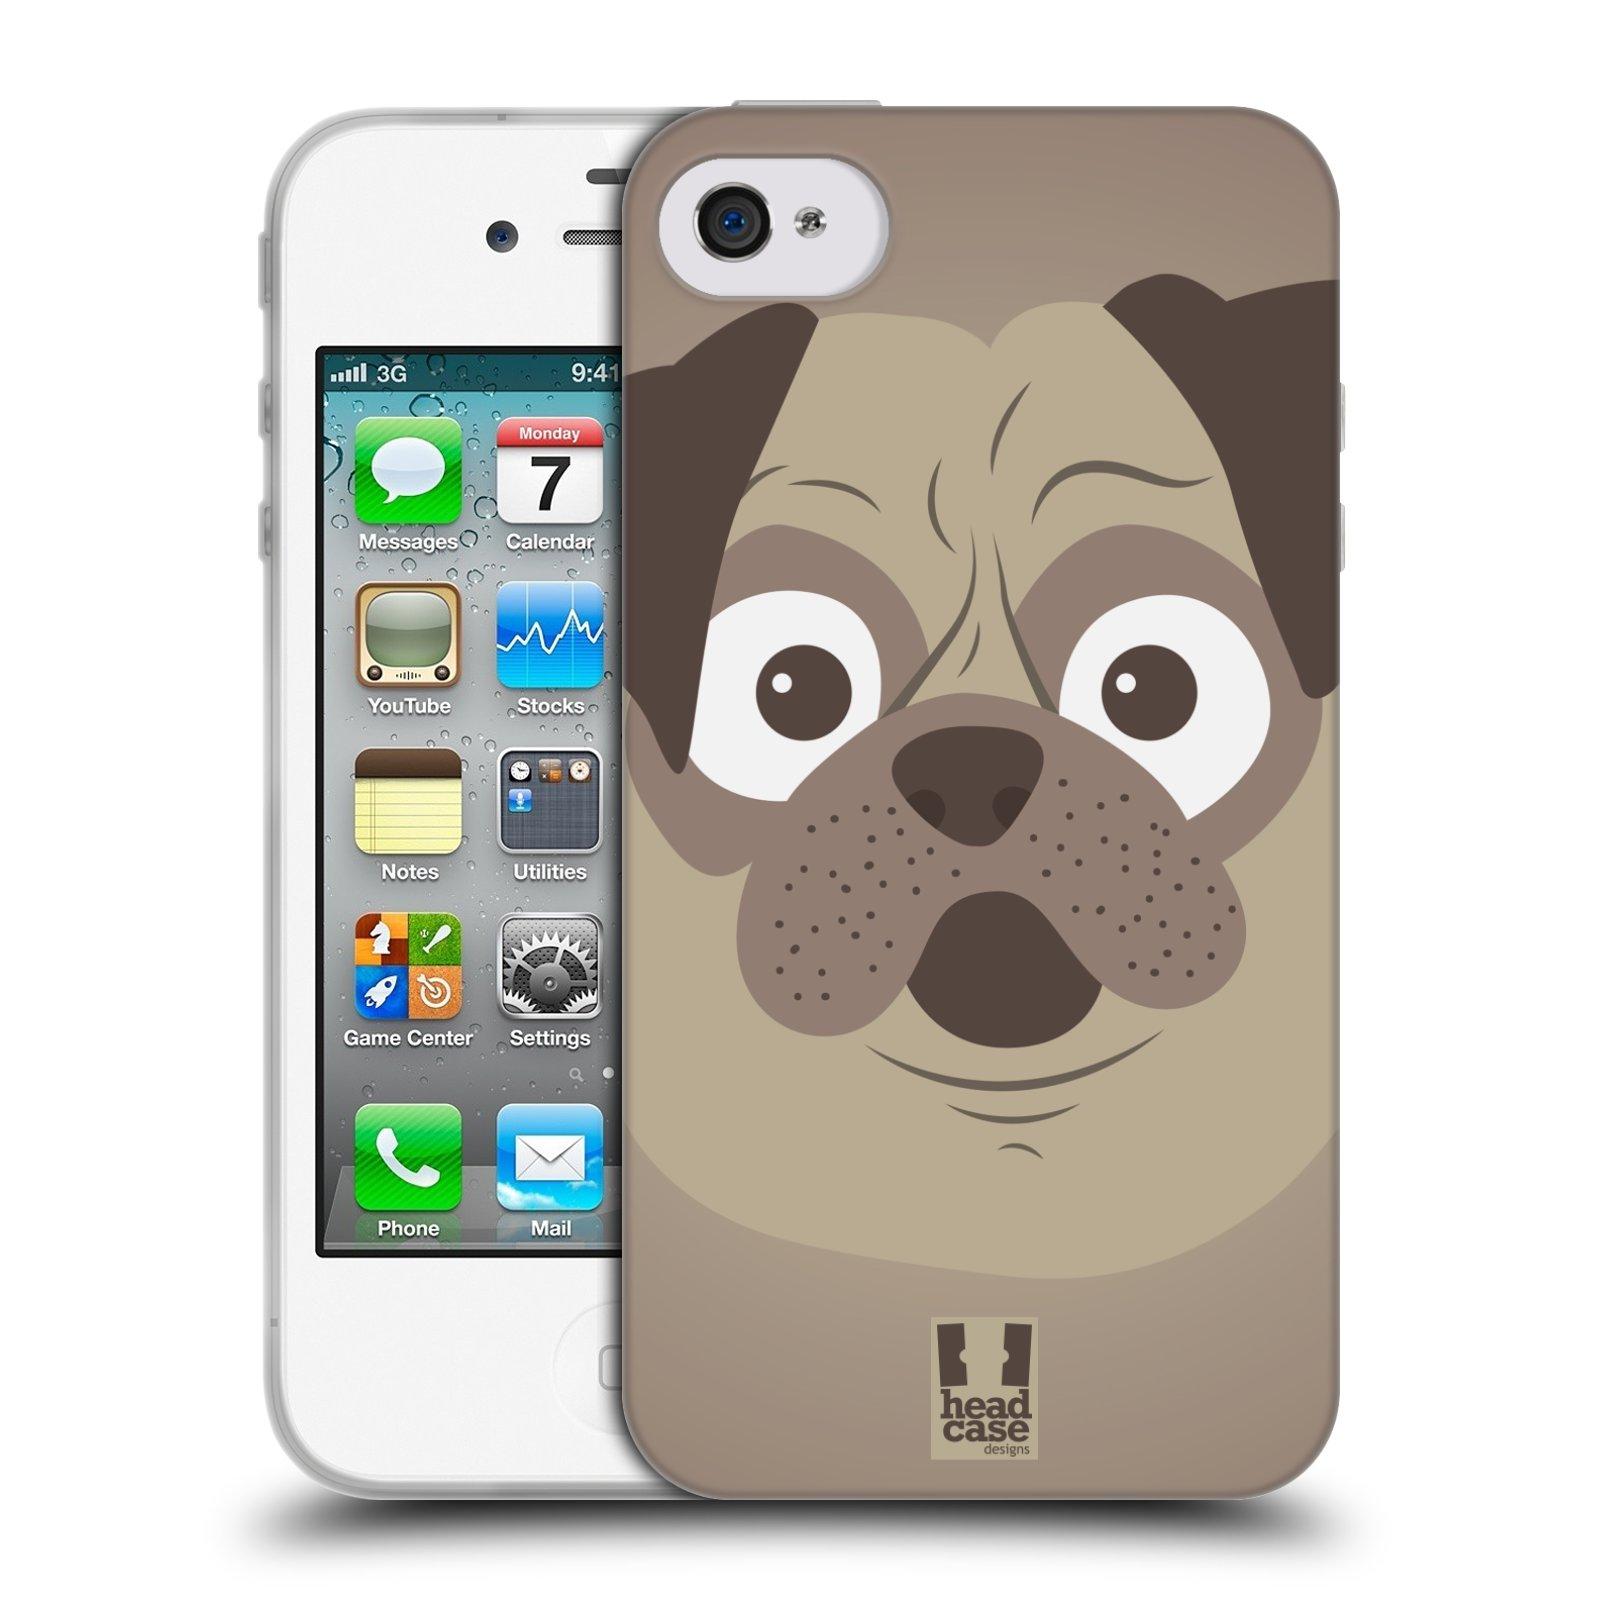 HEAD CASE silikonový obal na mobil Apple Iphone 4/4S vzor Cartoon Karikatura barevná kreslená zvířátka pes mopsík